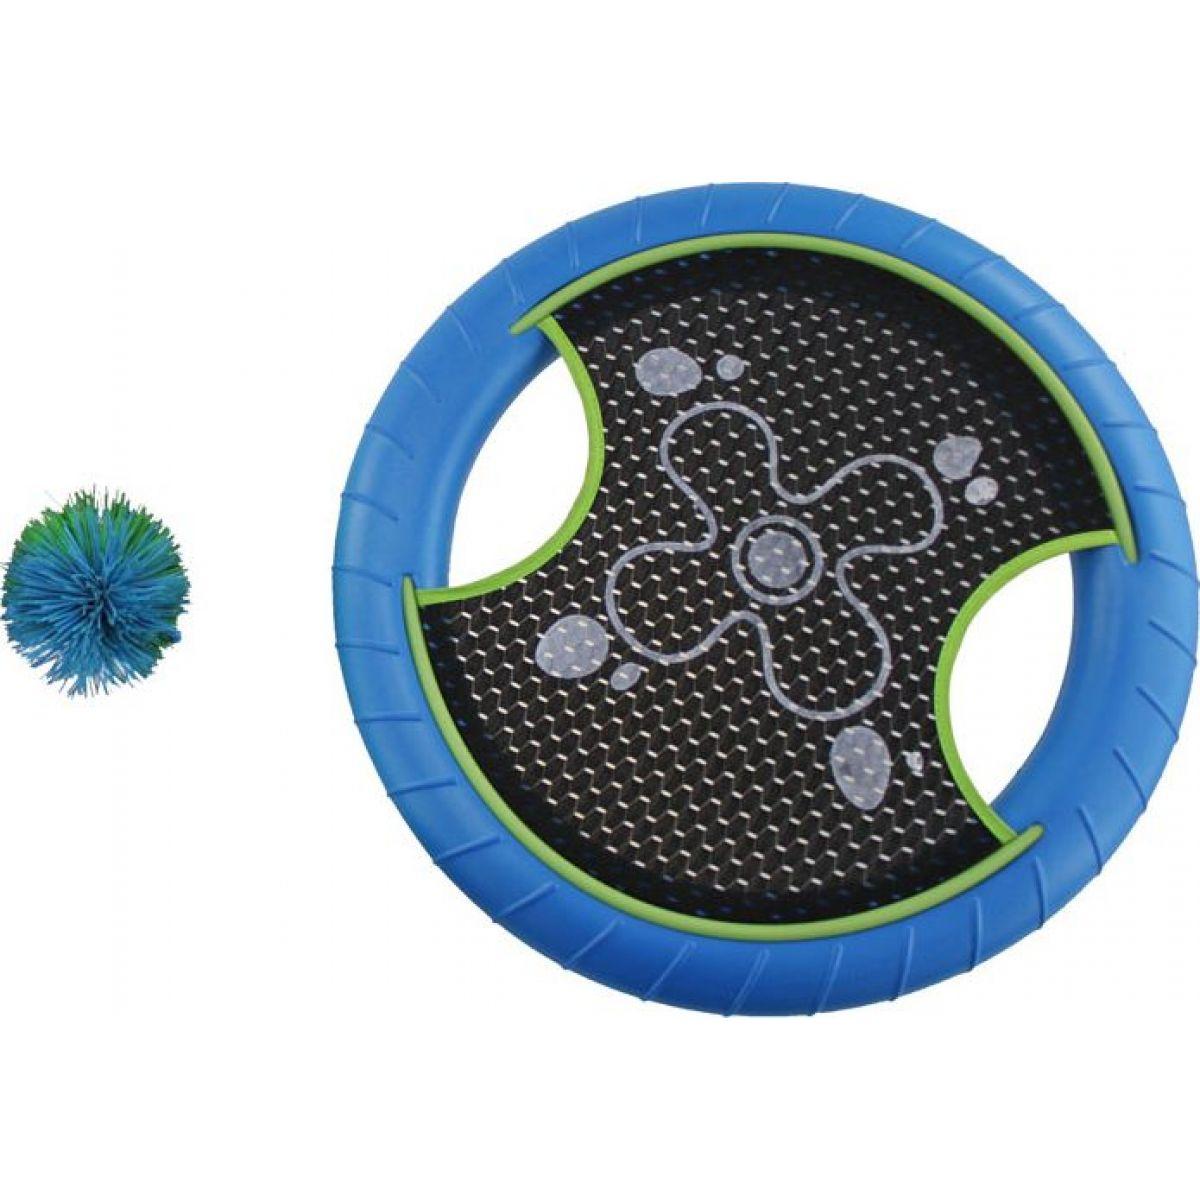 Phlat disc s loptičkou modrý